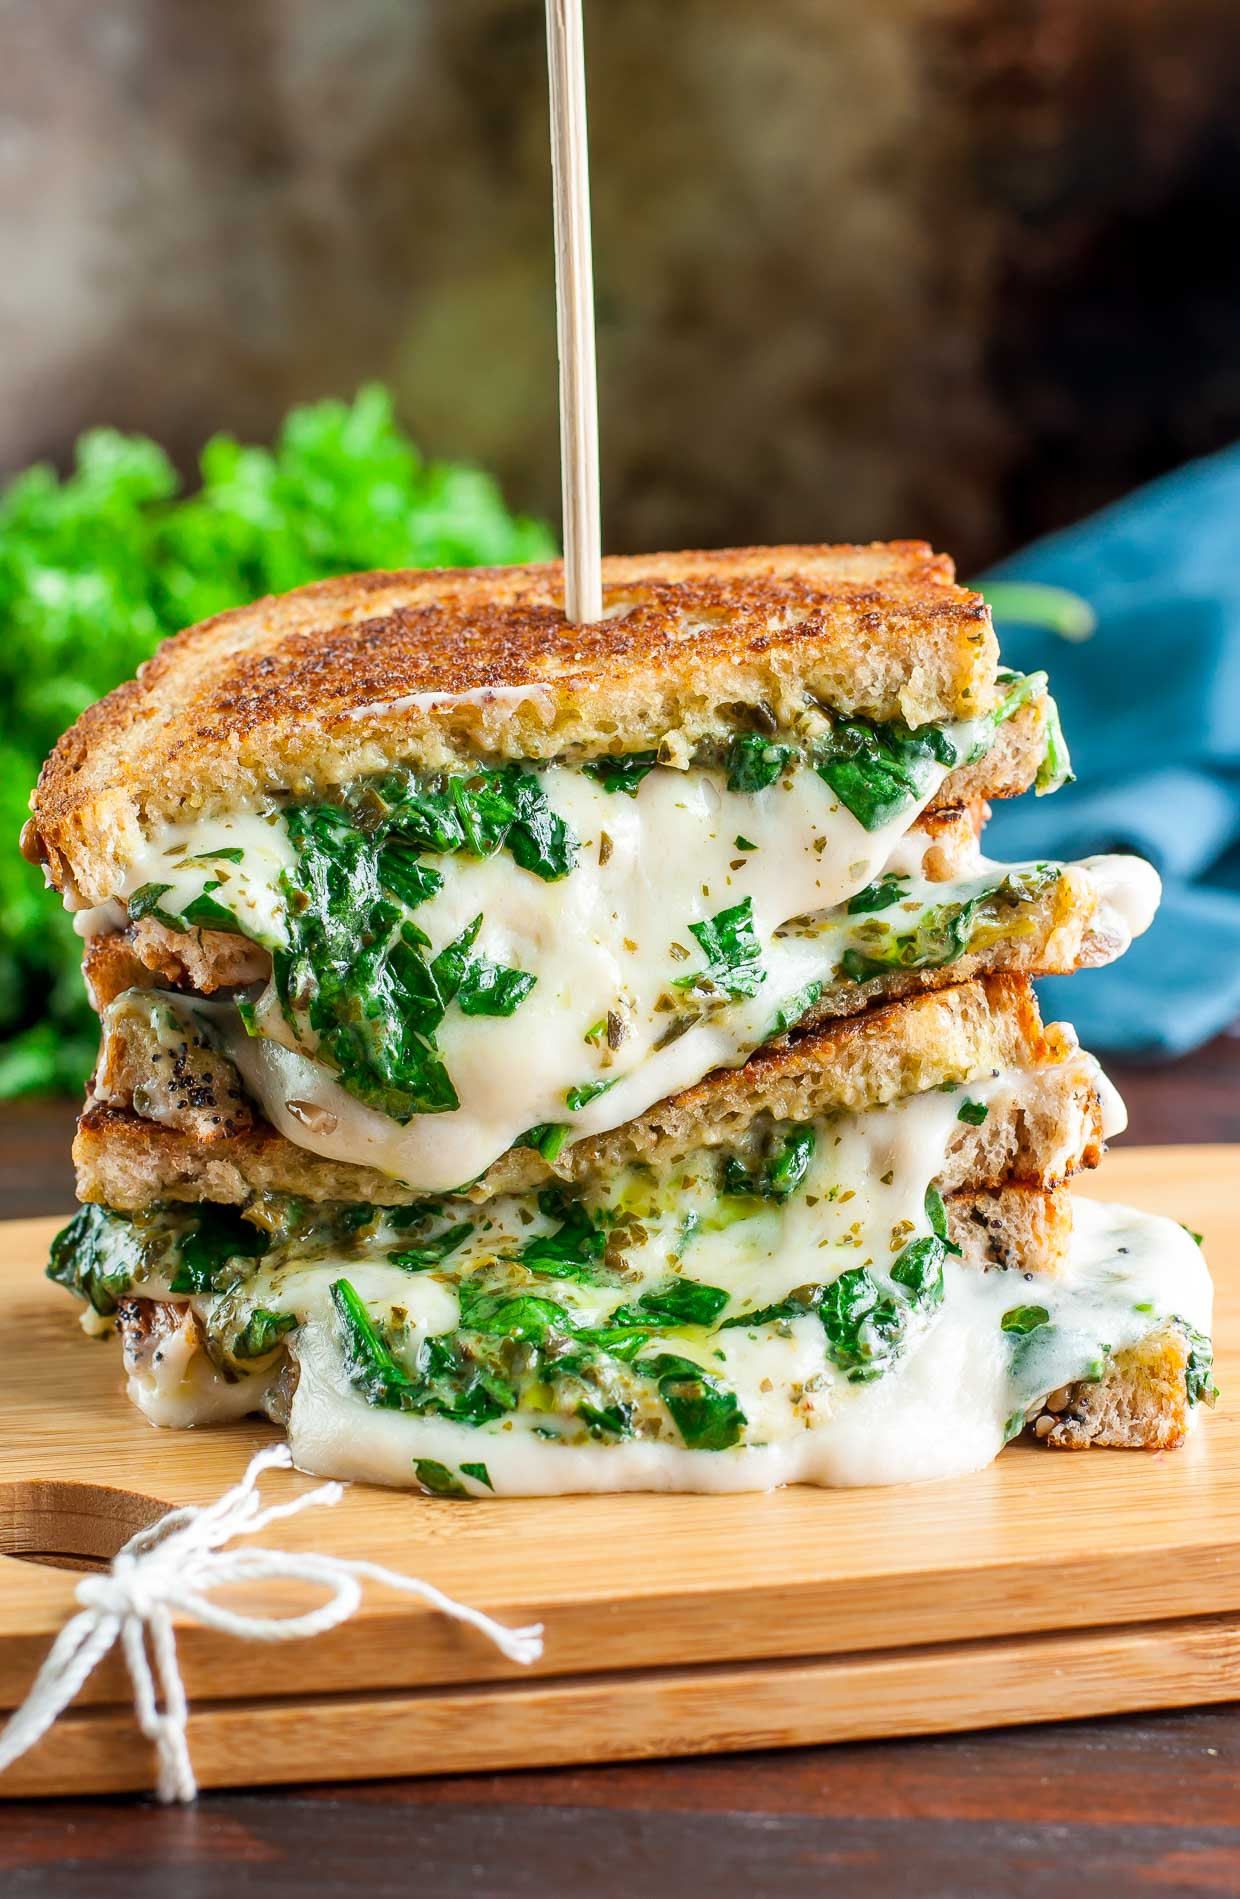 Vegan Grilled Cheese - Three Ways! VEGAN Spinach Pesto Grilled Cheese